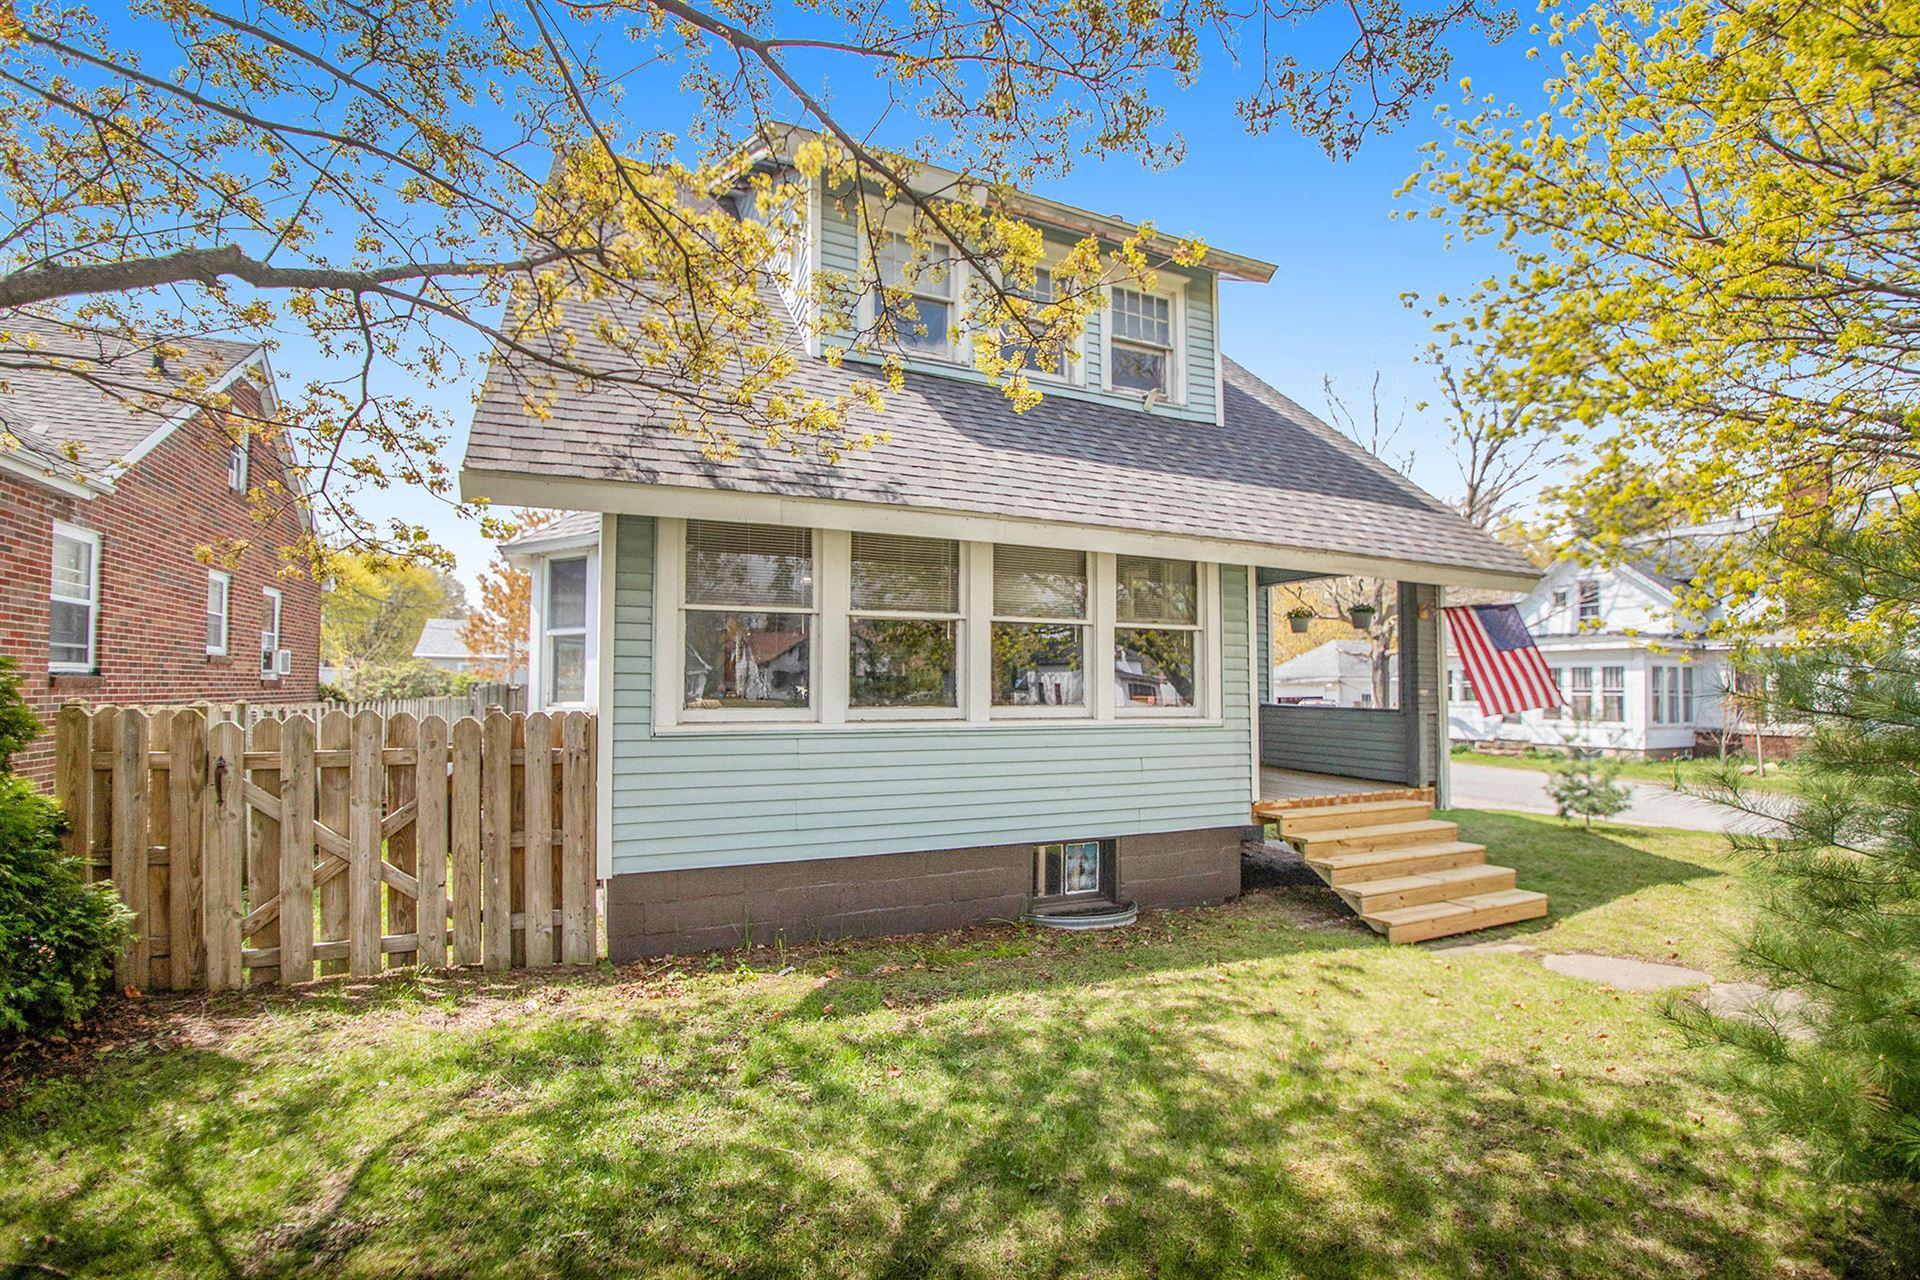 1682 Colfax Avenue, Benton Harbor, MI 49022 - MLS#: 21014041